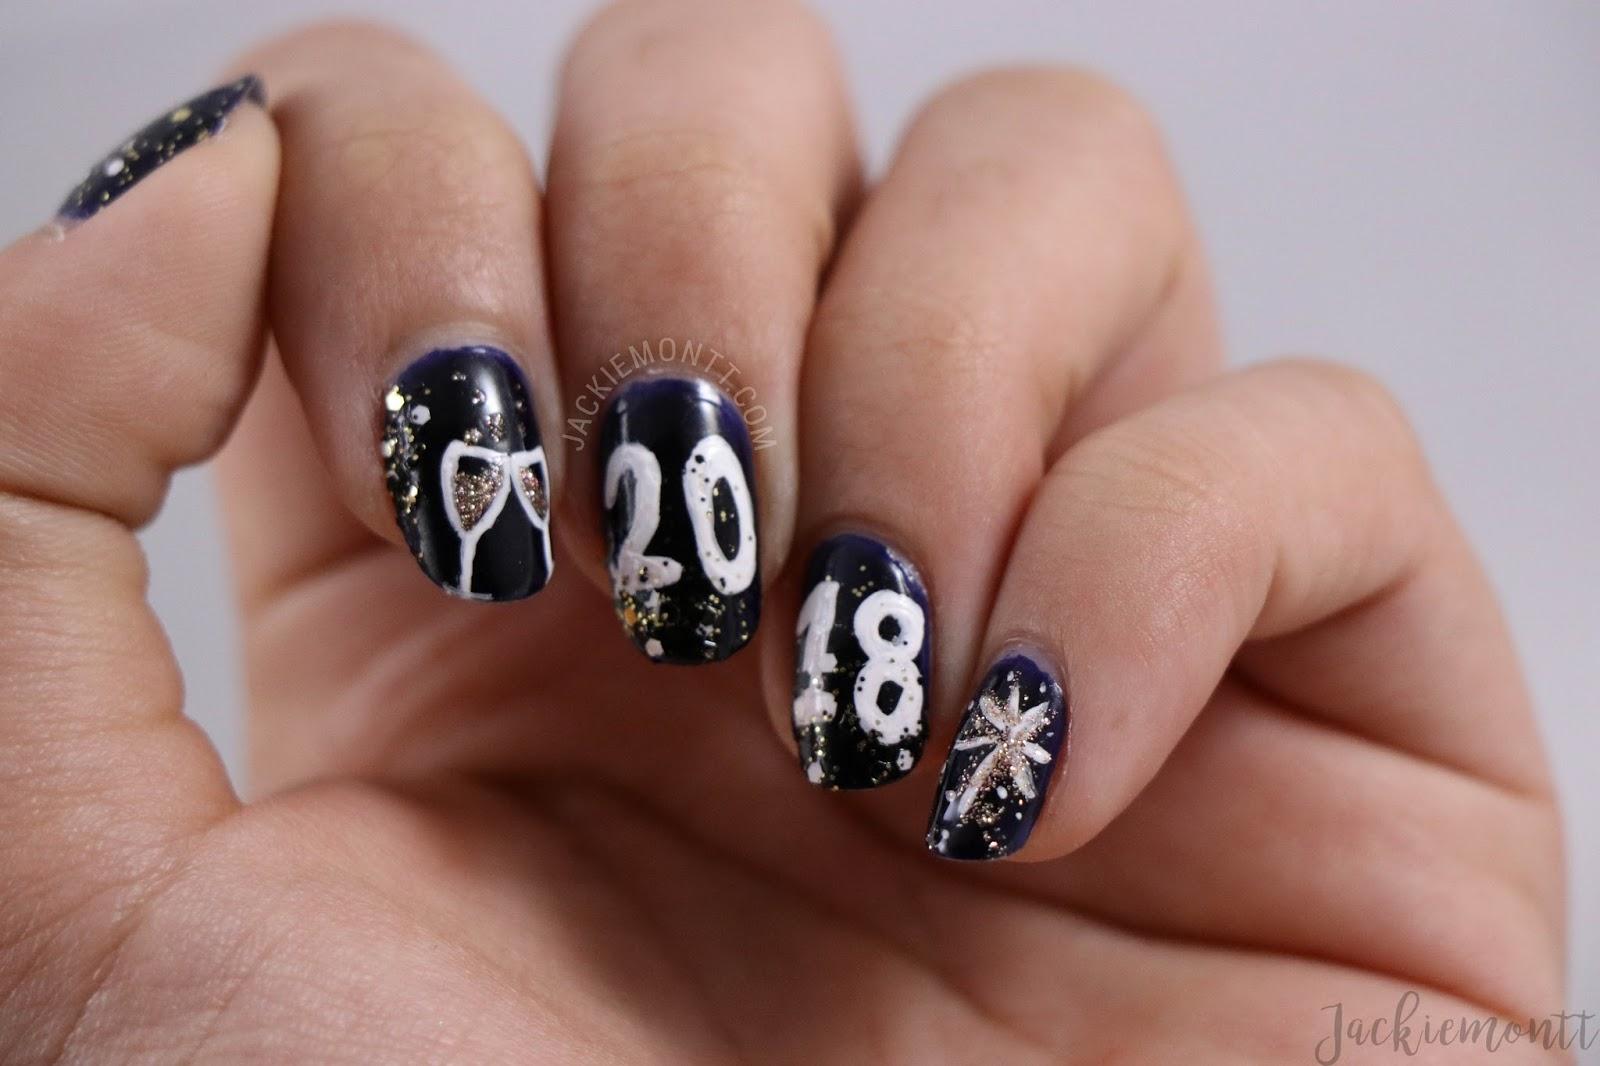 New Year's Eve Nail Art  - JACKIEMONTT